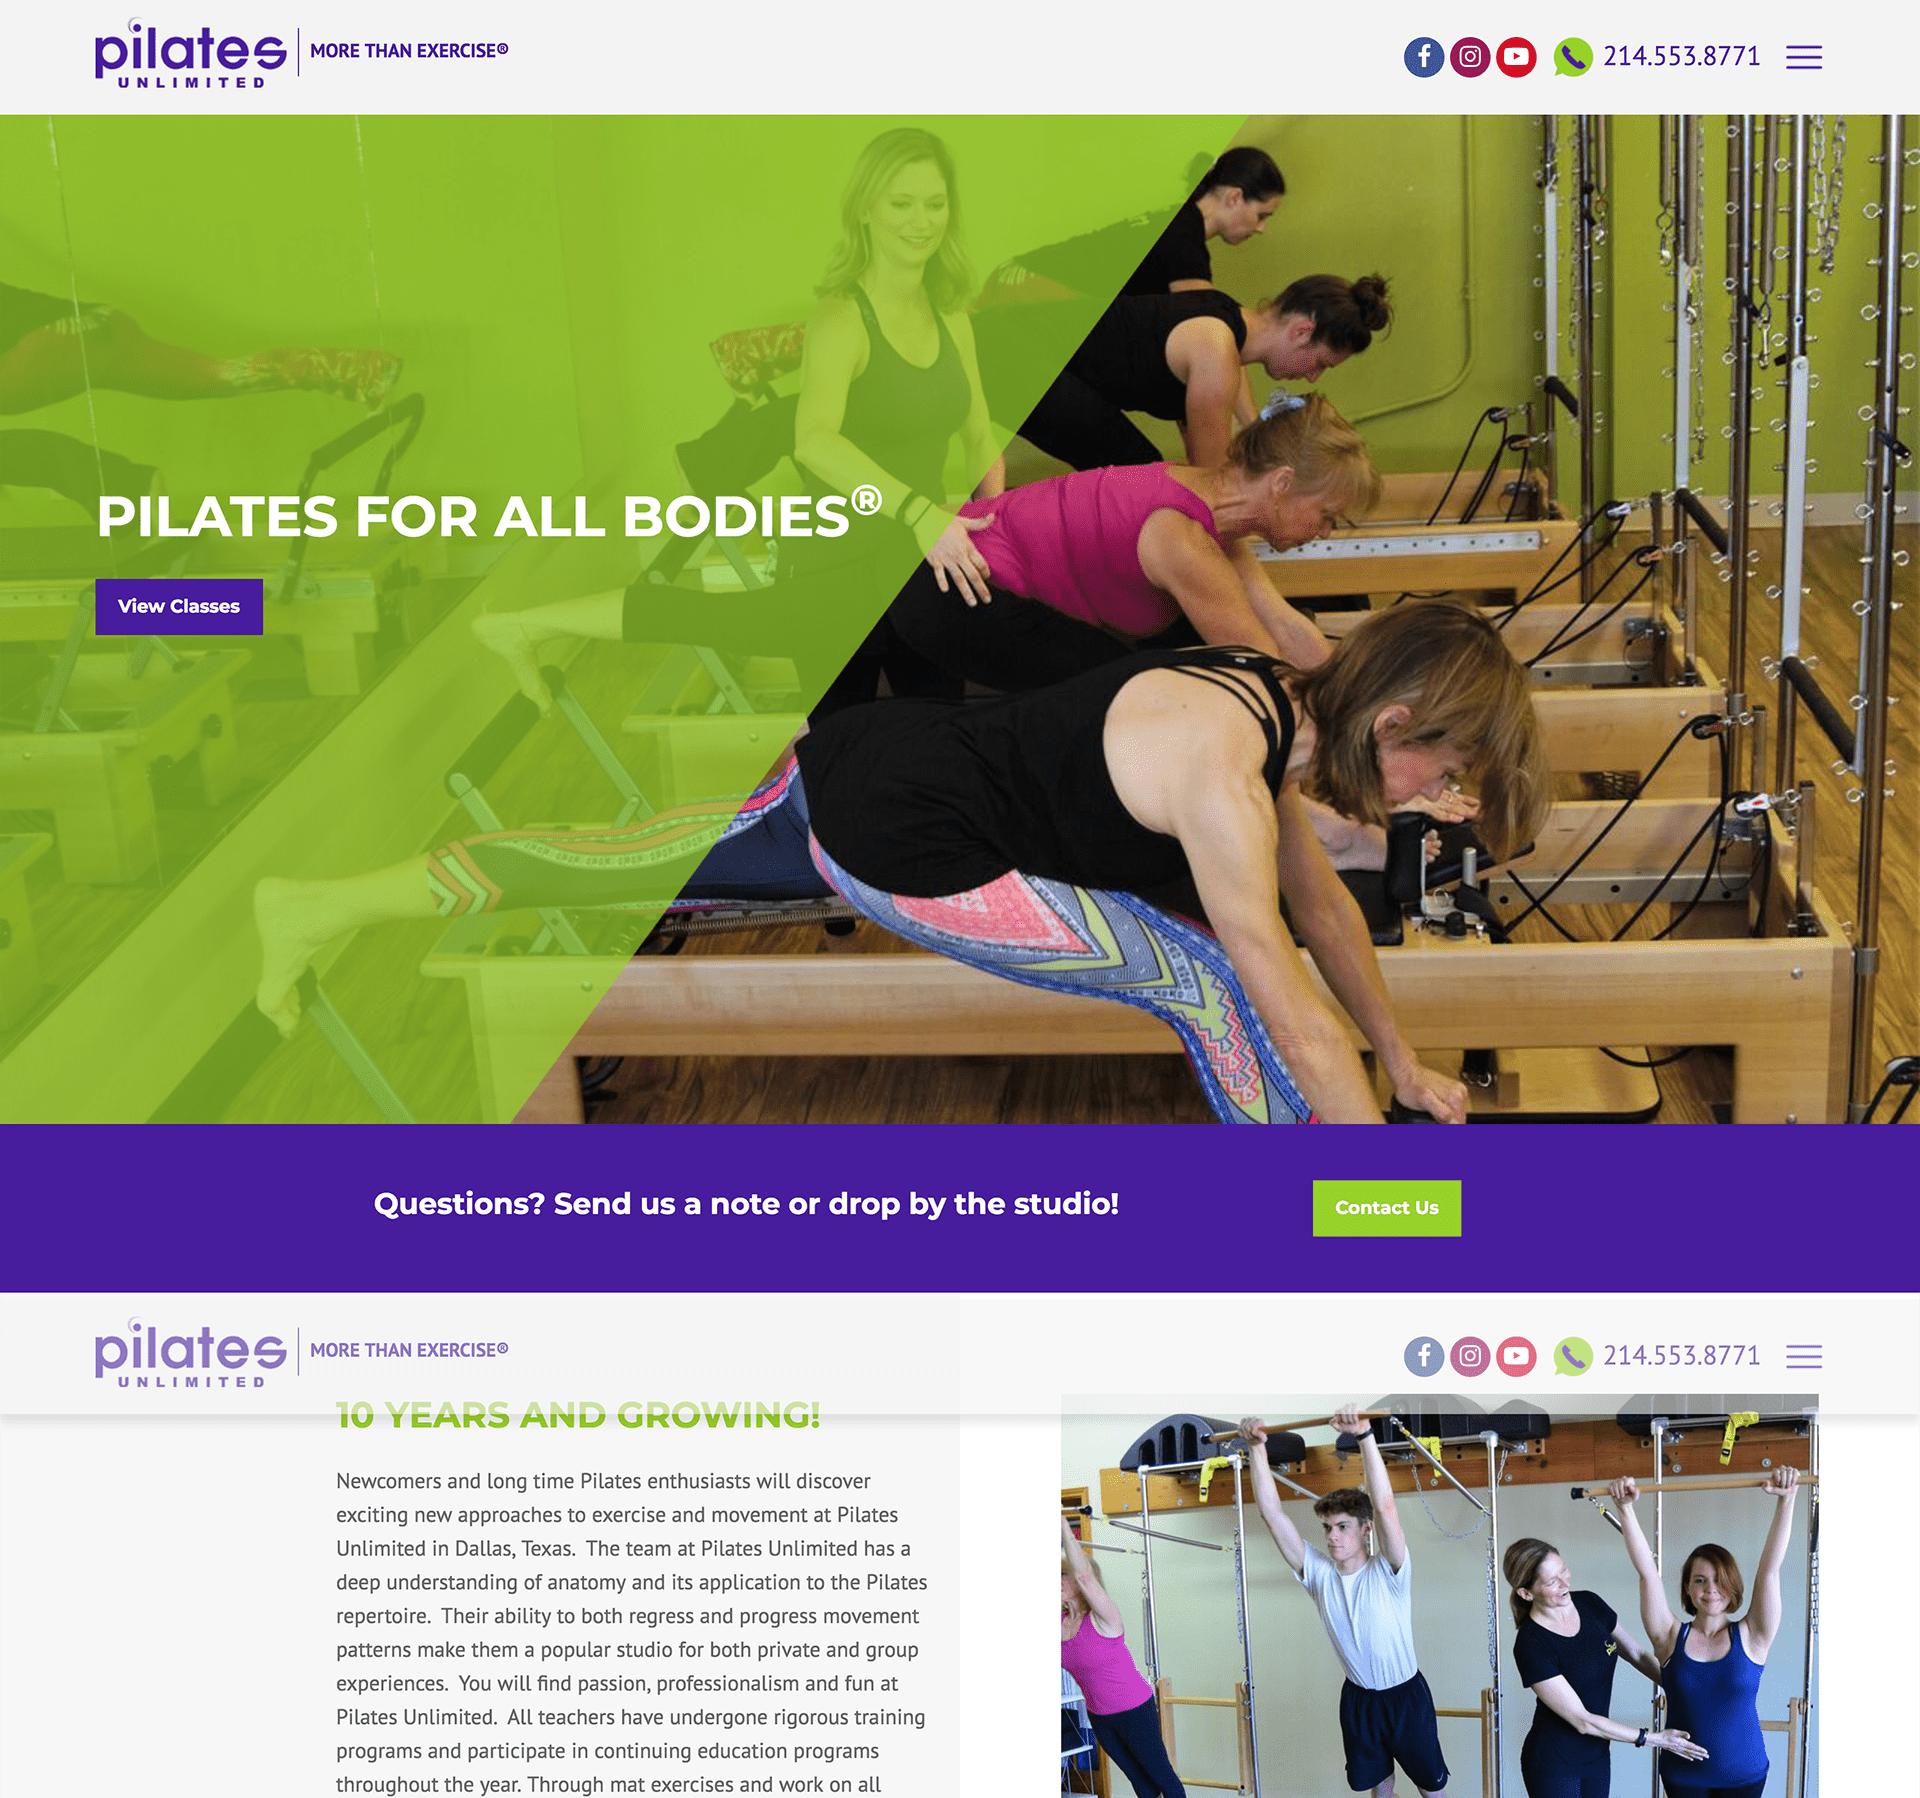 Pilates Unlimited